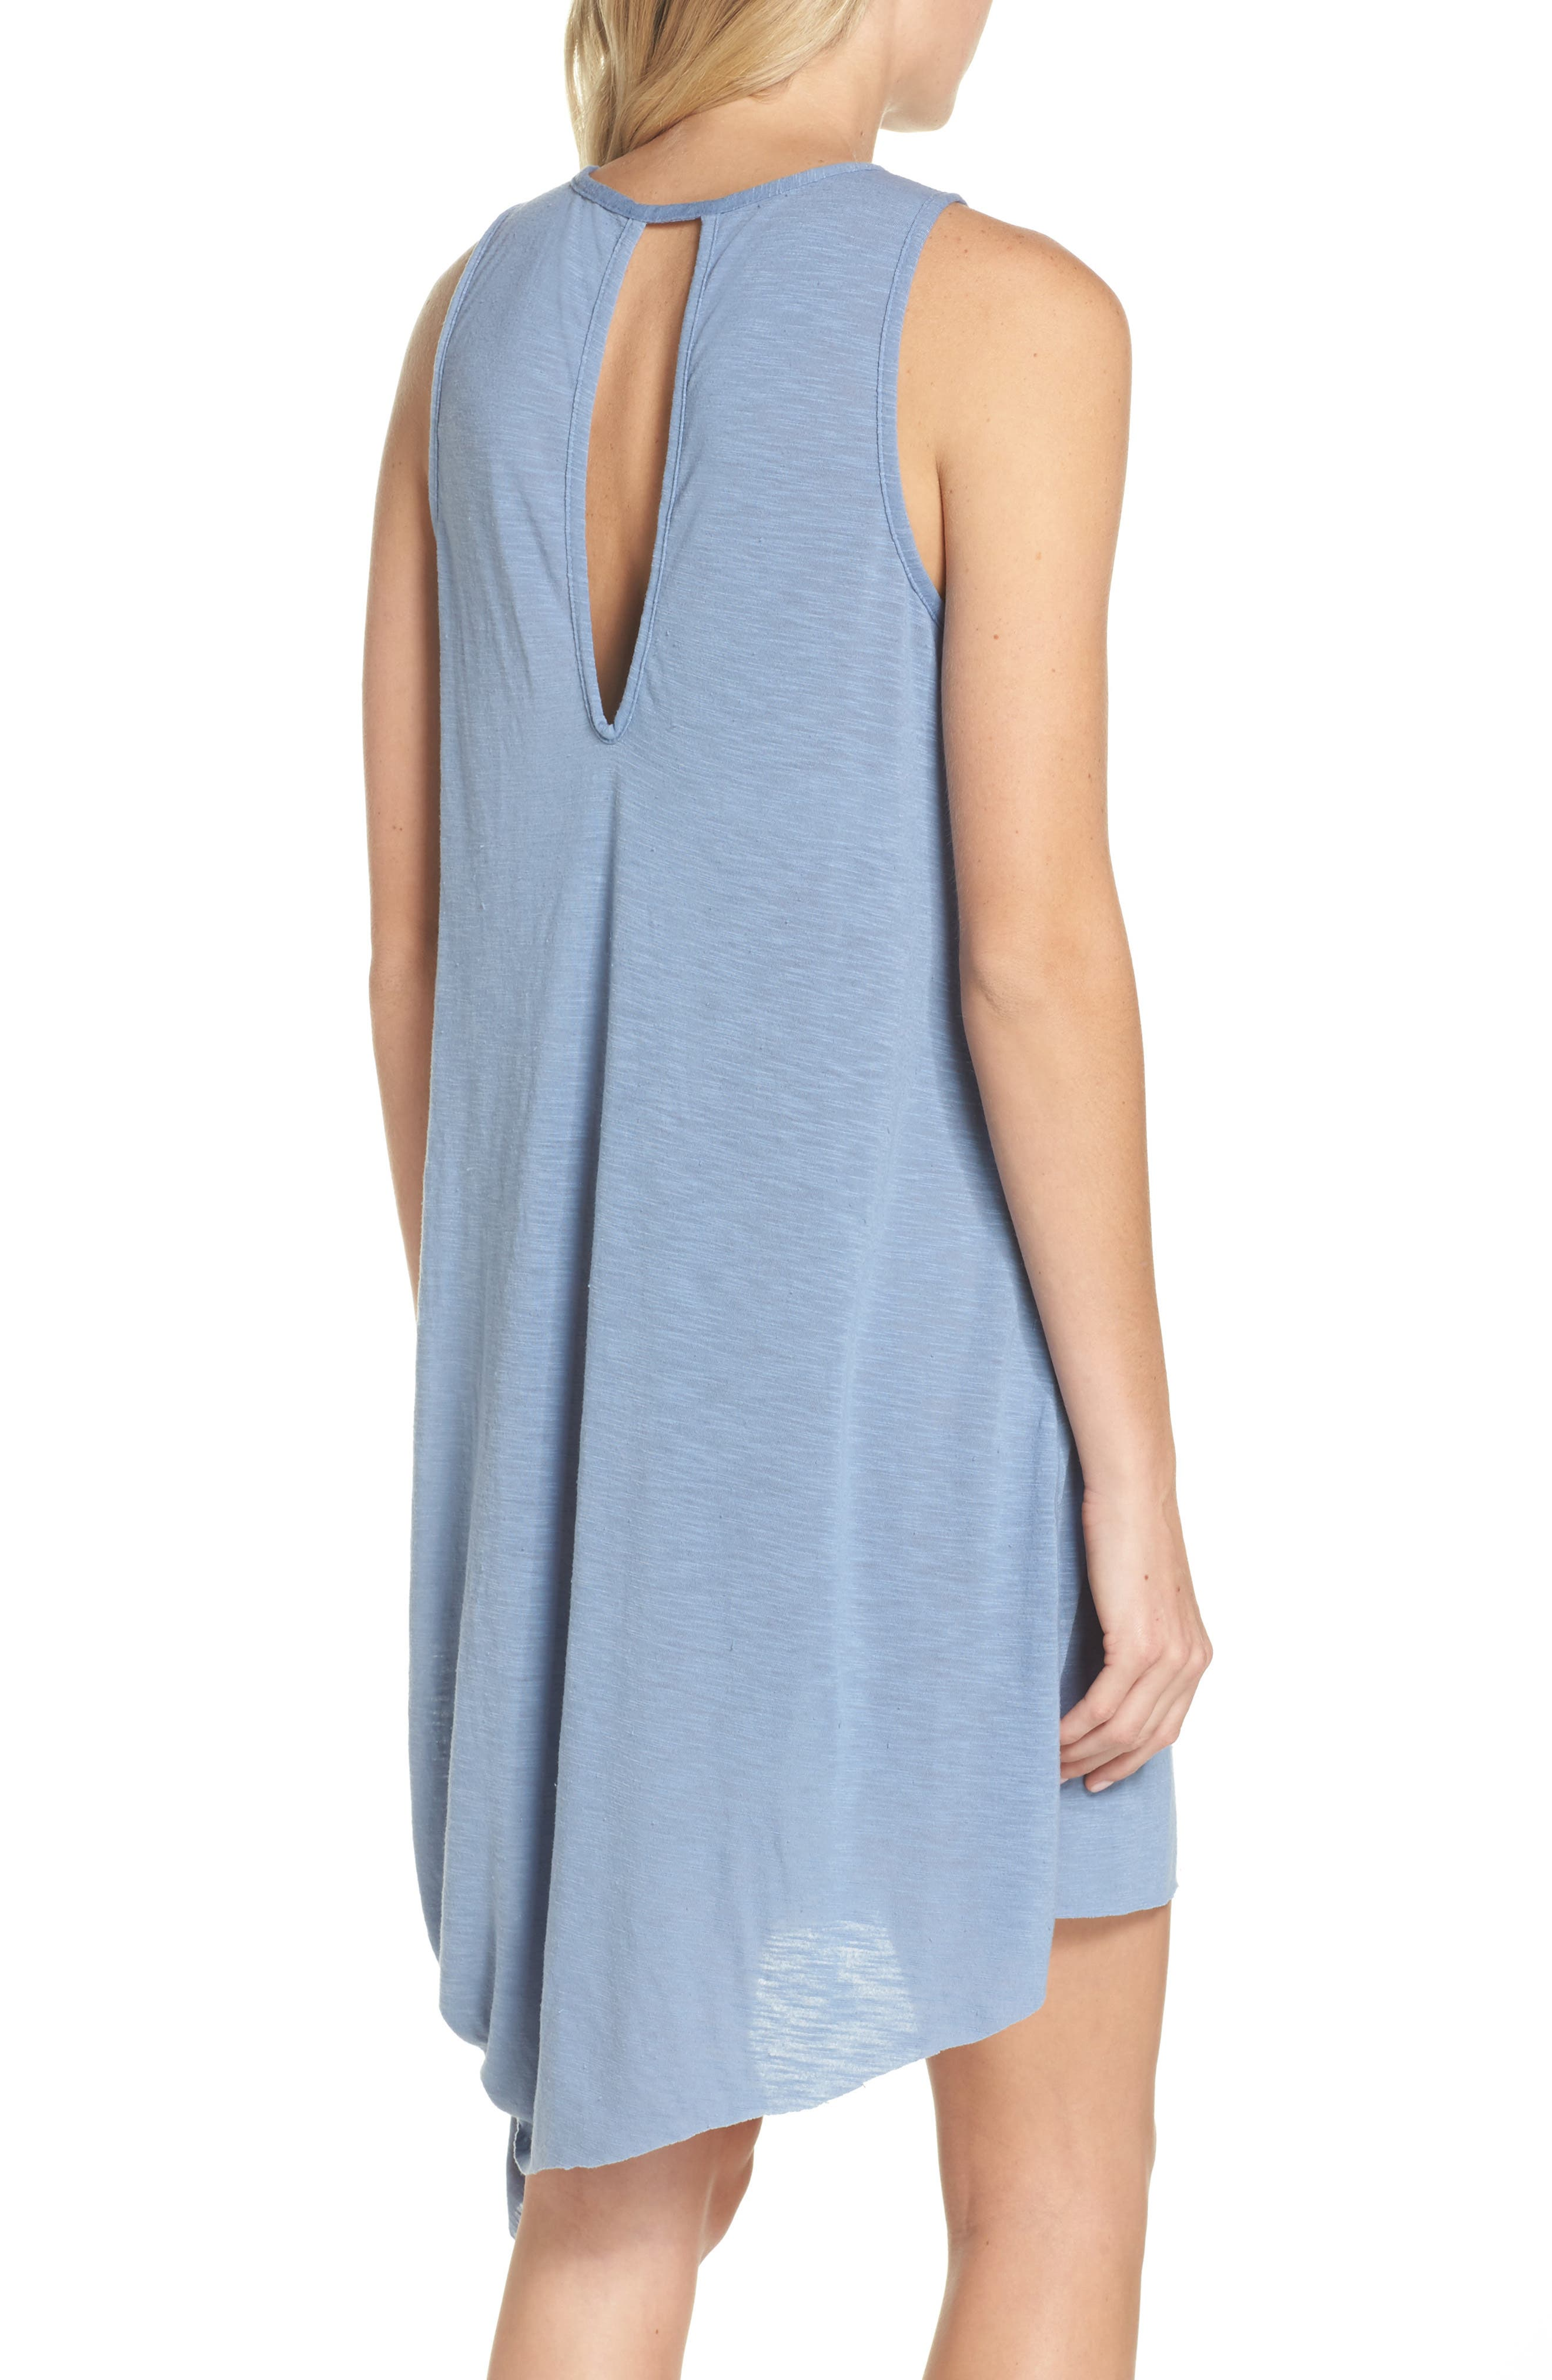 Breezy Basics Cover-Up Dress,                             Alternate thumbnail 2, color,                             Steel